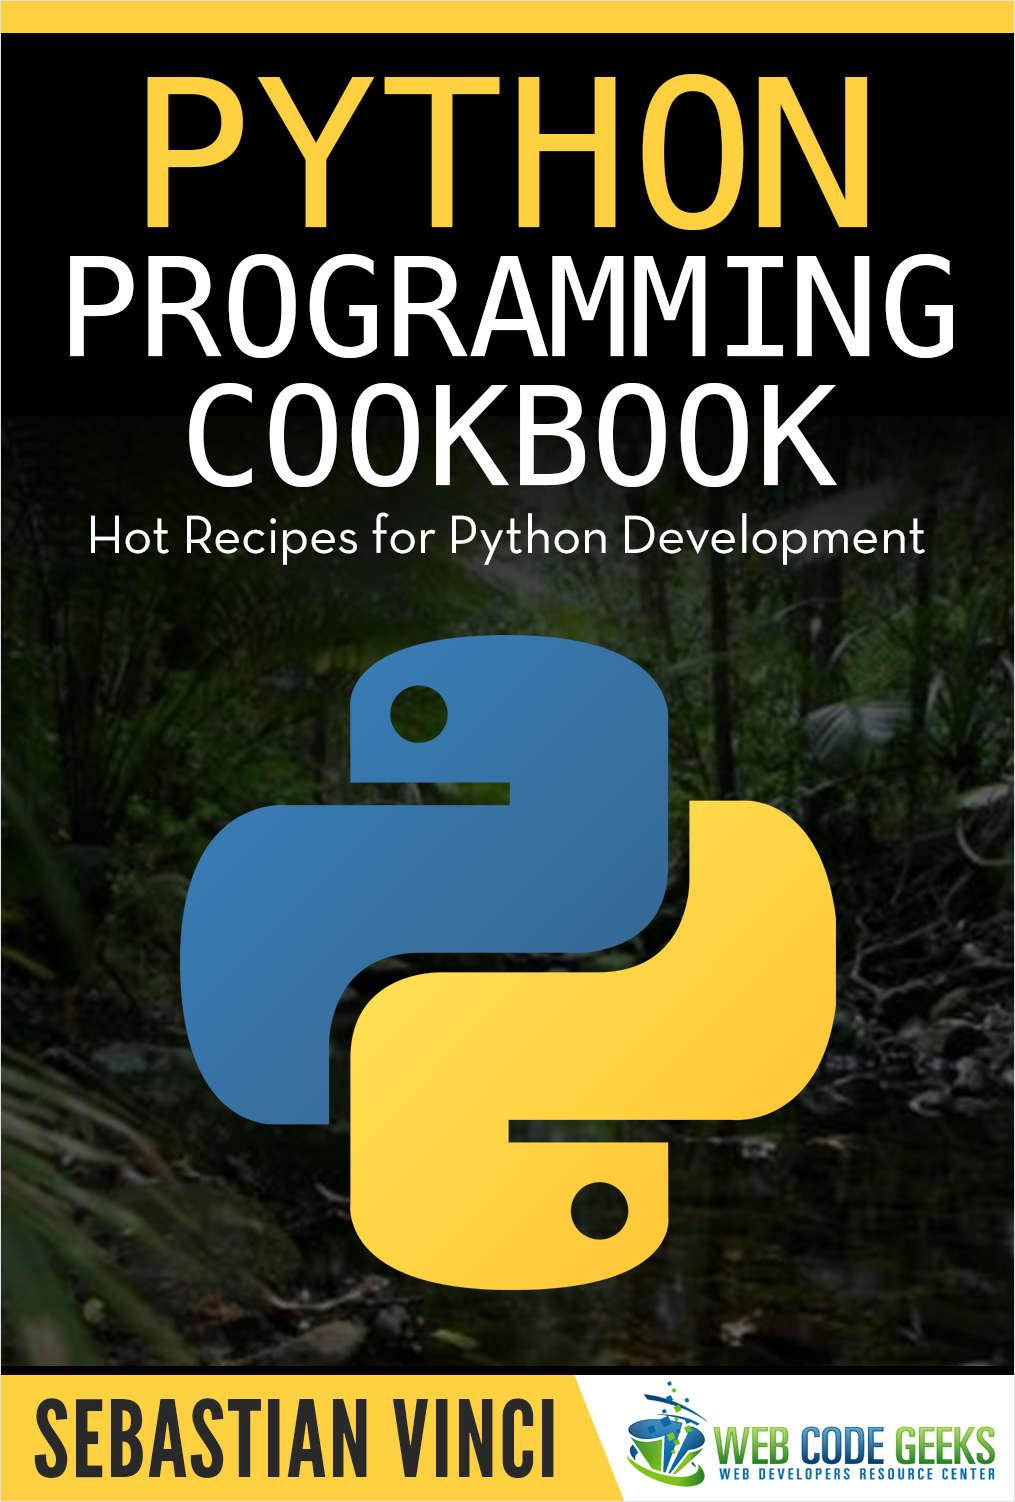 Python Programming Cookbook, gratis